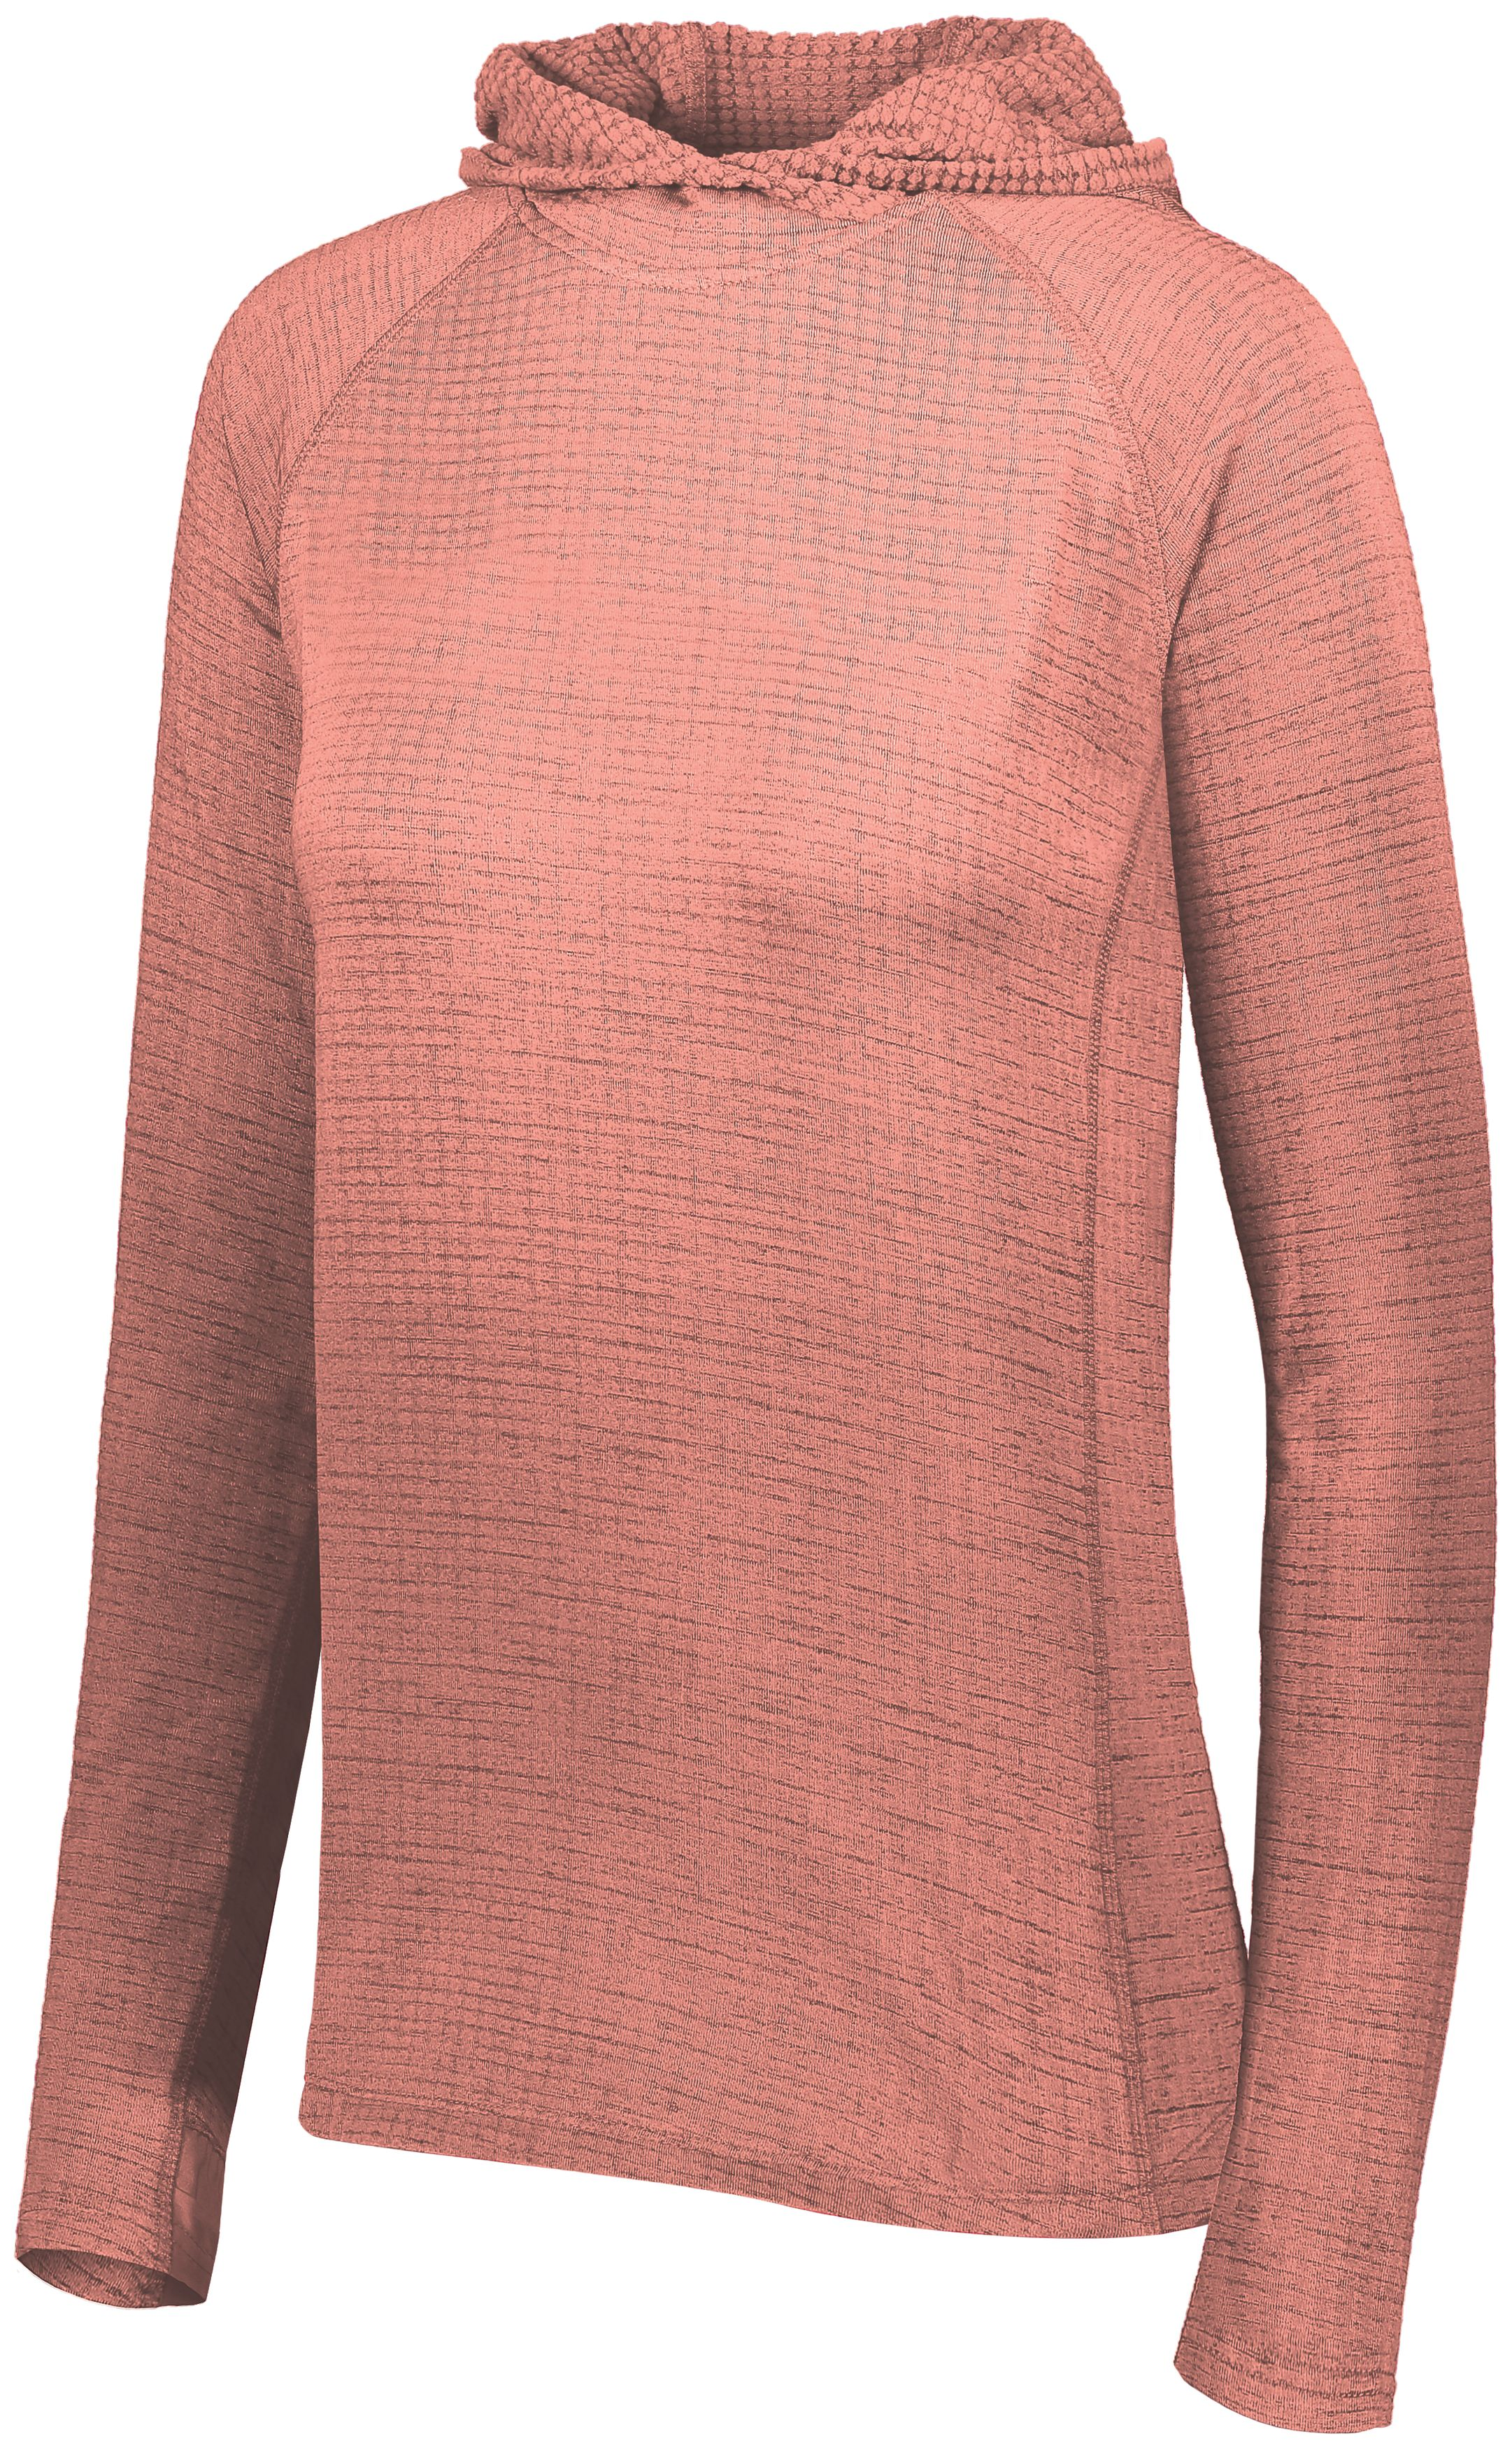 Ladies 3D Regulate Lightweight Pullover - CORAL HEATHER